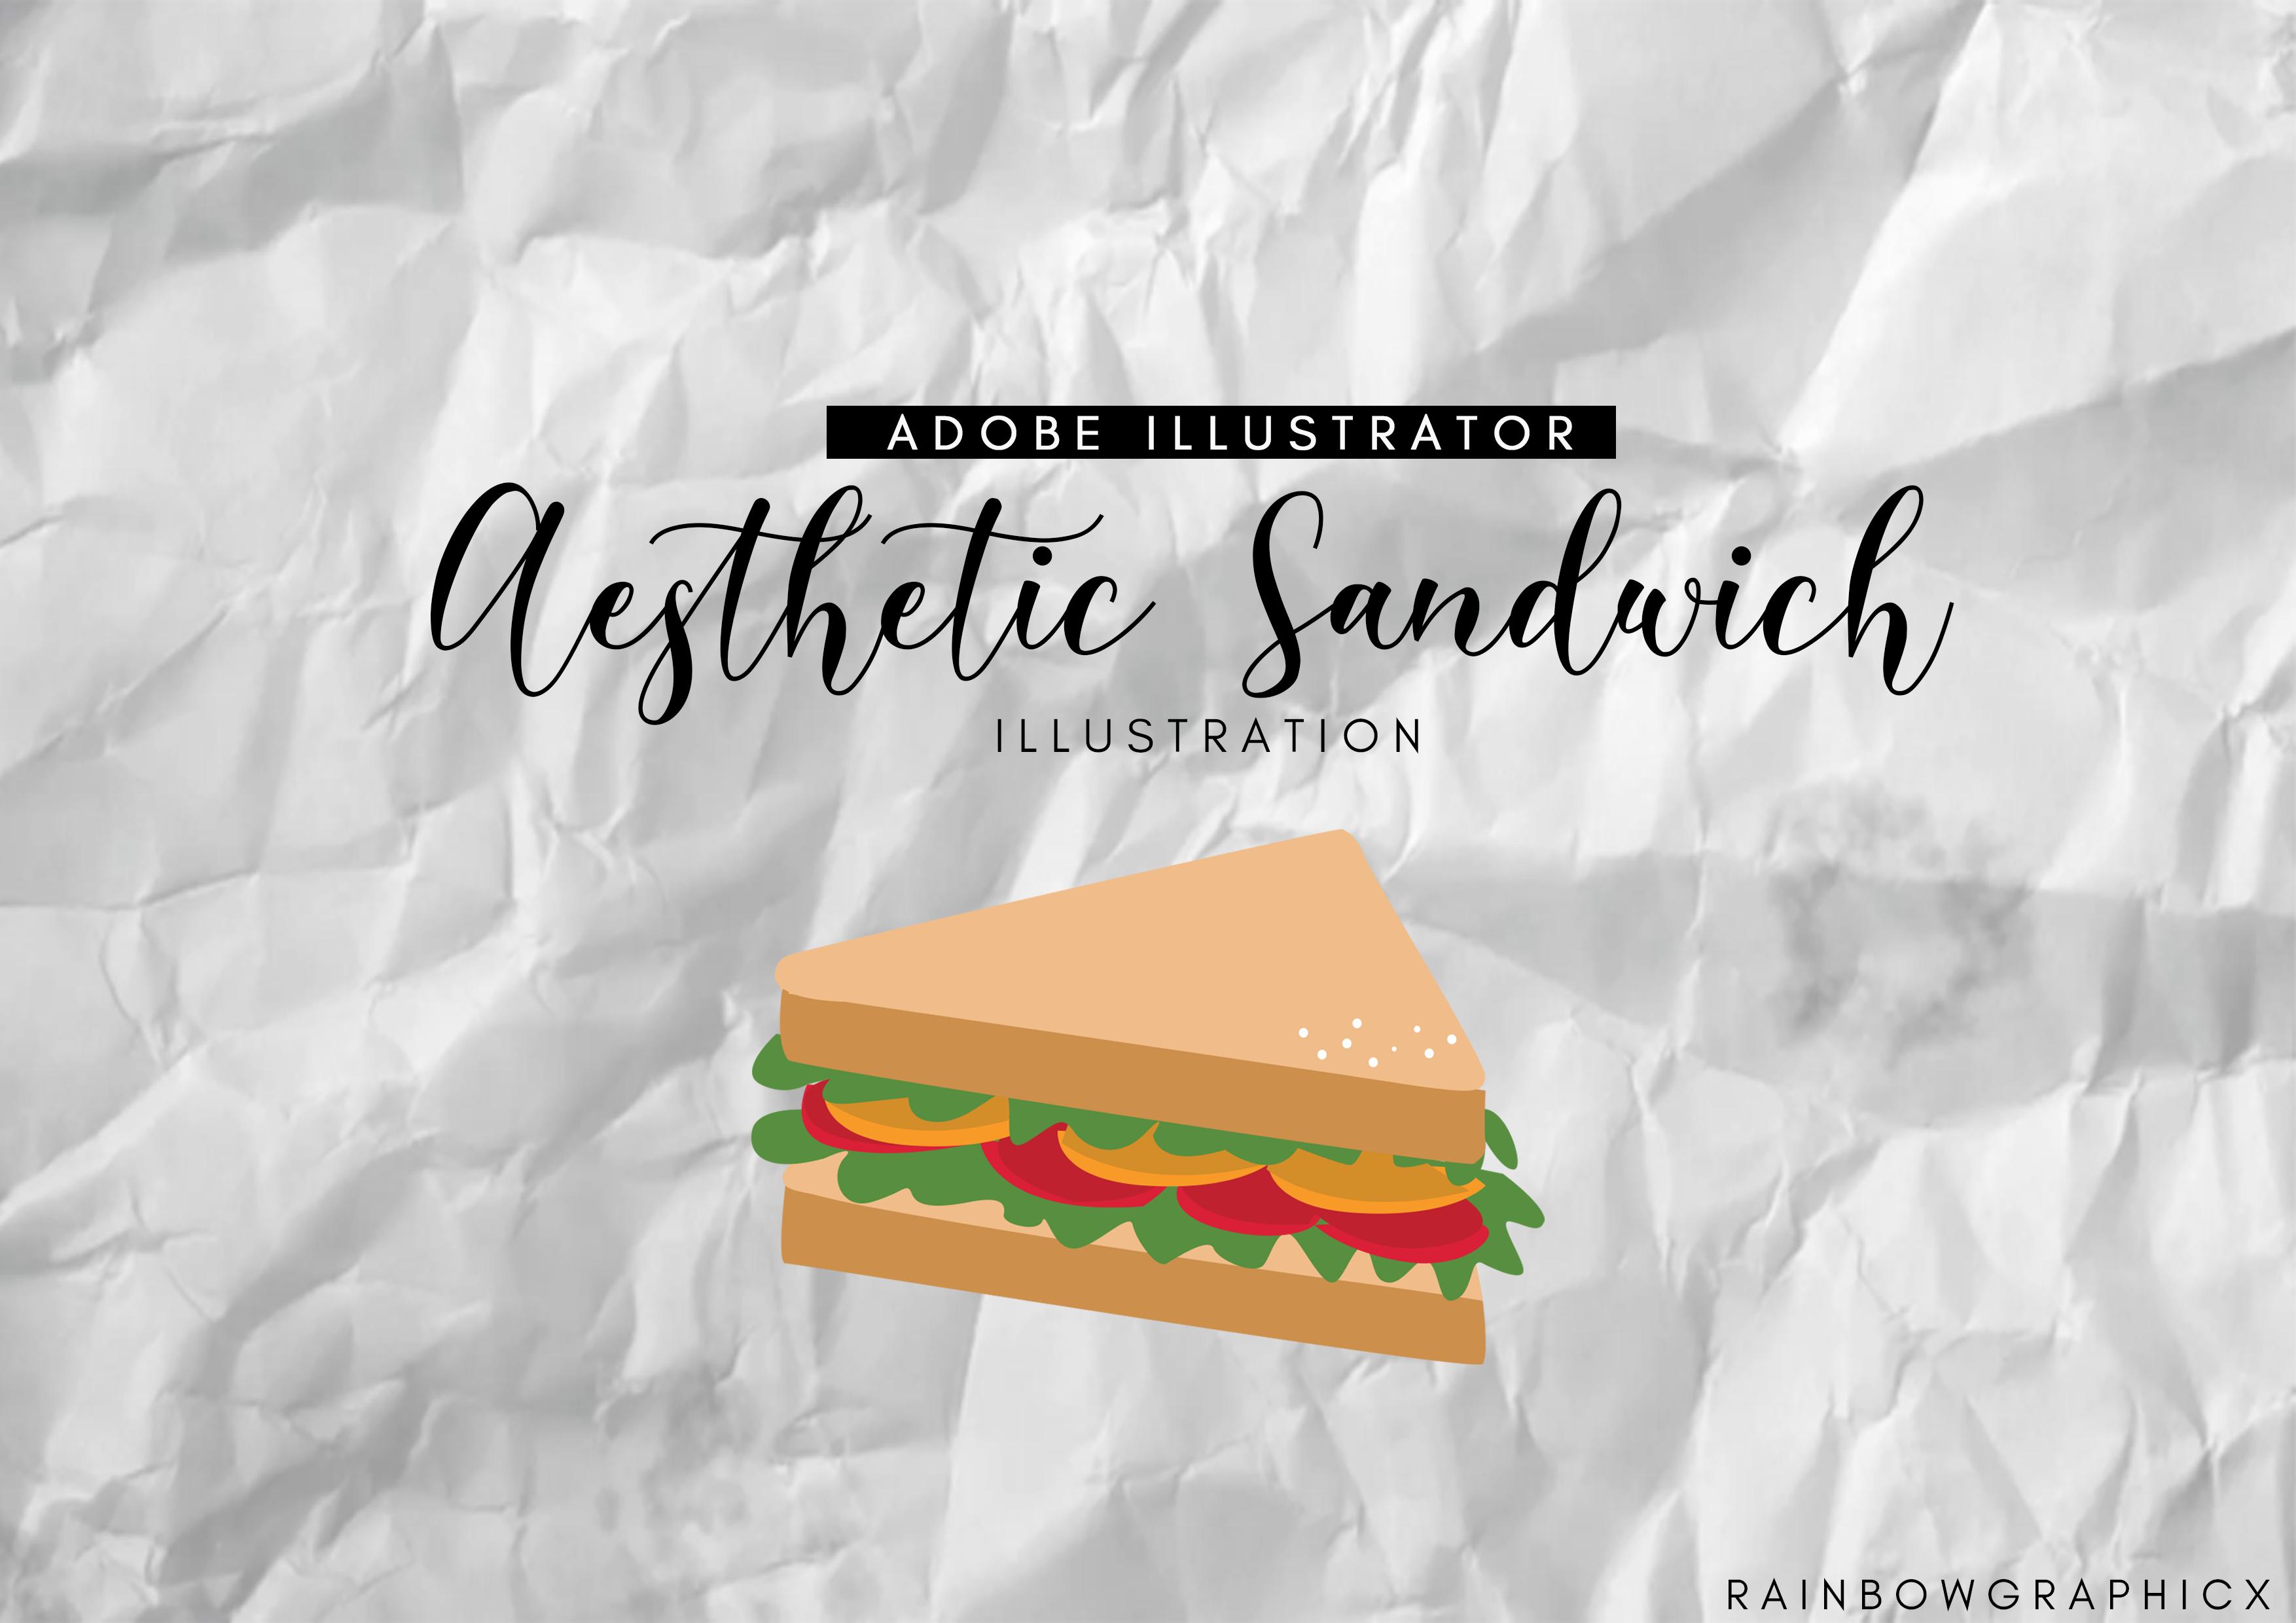 Aesthetic Sandwich Illustration Graphic By Rainbowgraphicx Creative Fabrica